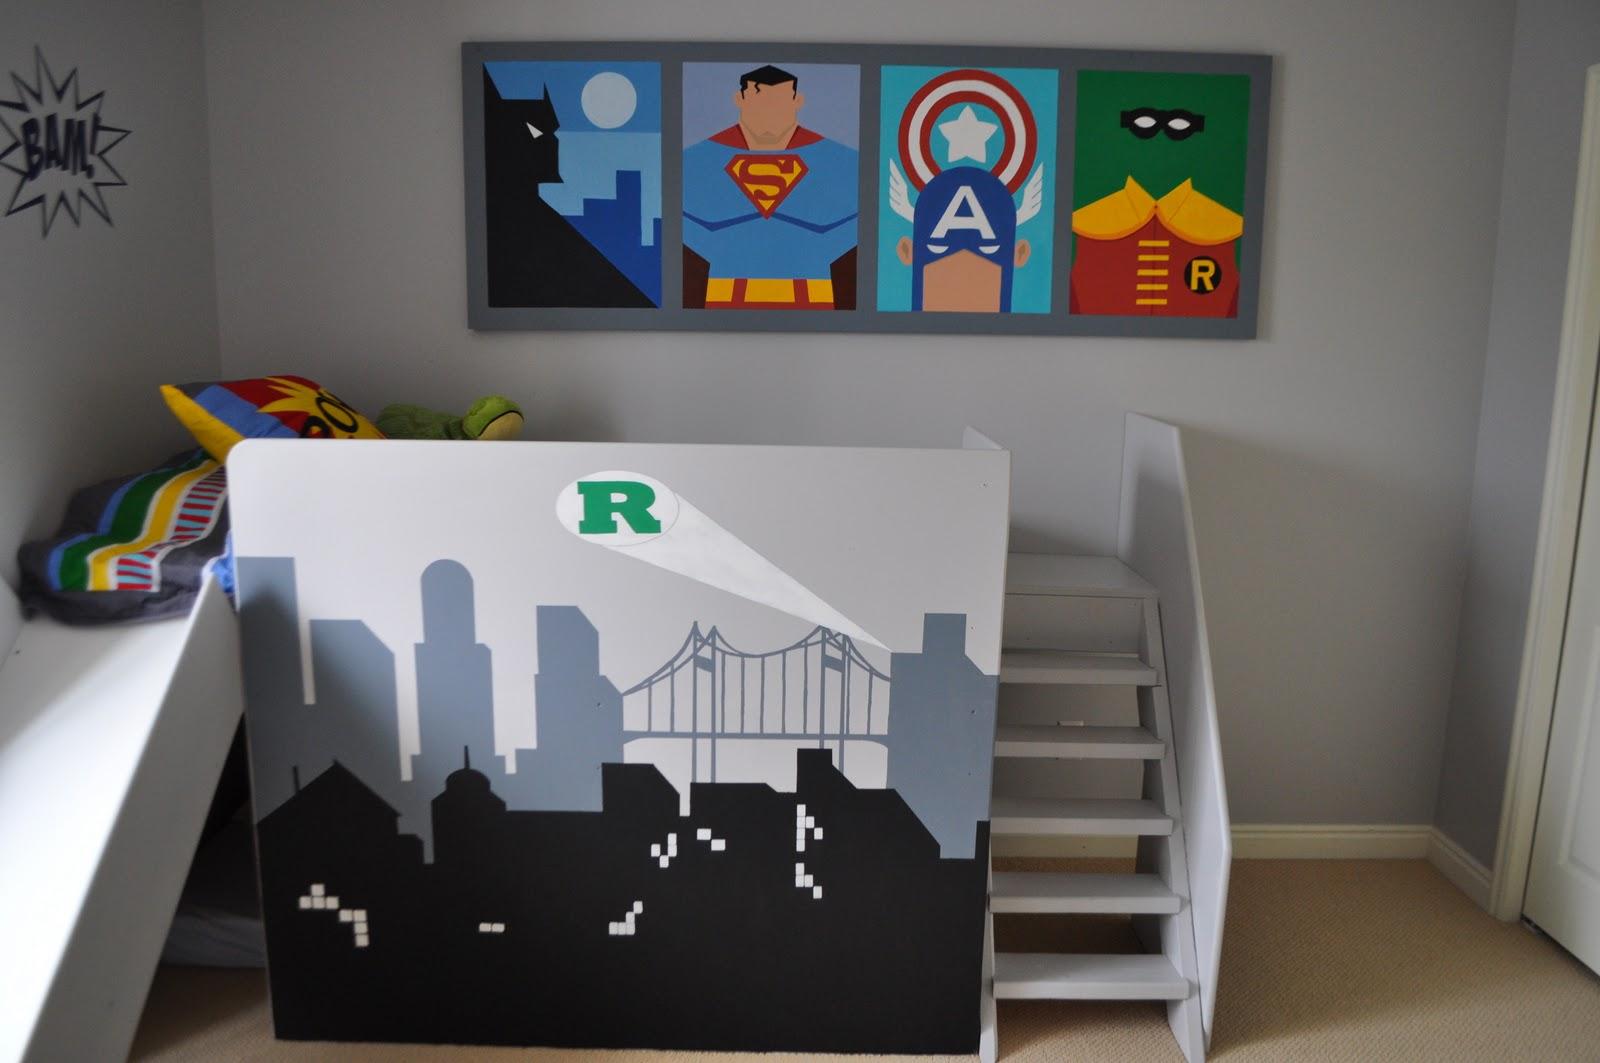 marvel for hero beds and ideas boy cool superhero of unique bedroom on comic super superheroes wallpaper boys size toddler medium kids room